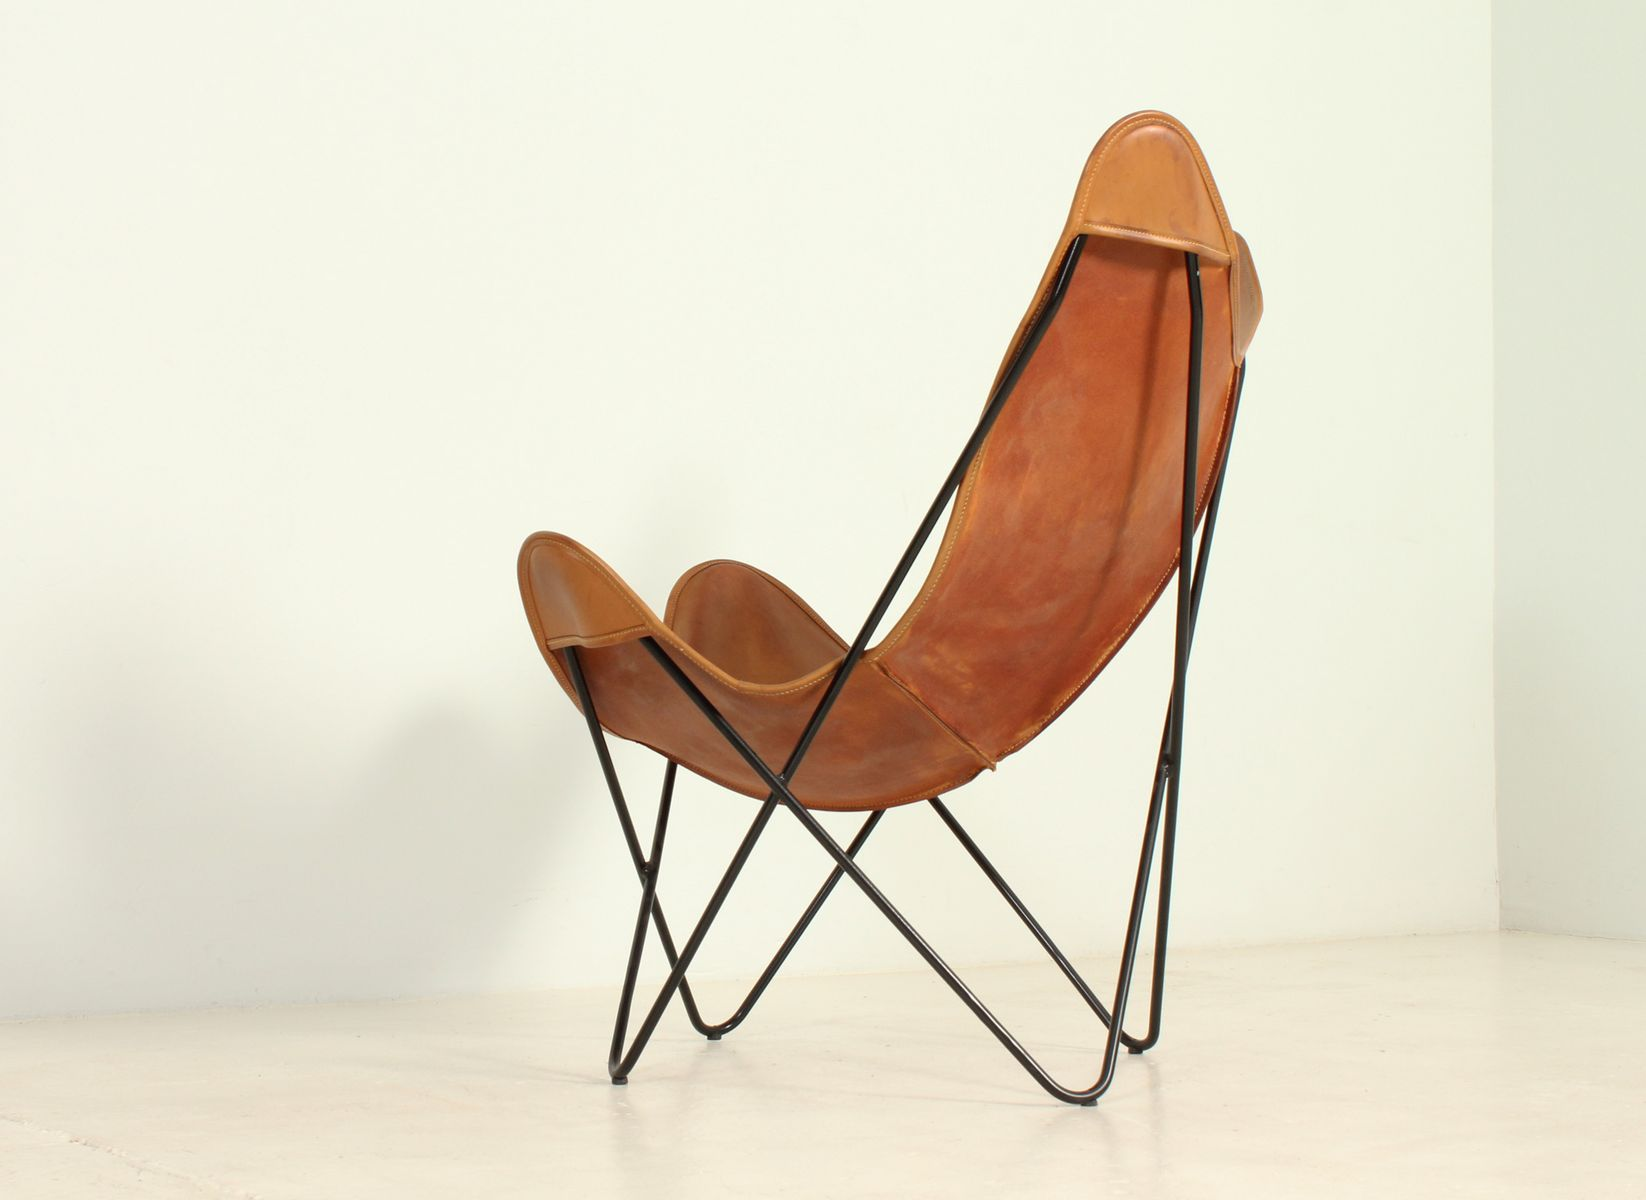 chaise butterfly par ferrari kurchan and bonet 1970s en. Black Bedroom Furniture Sets. Home Design Ideas